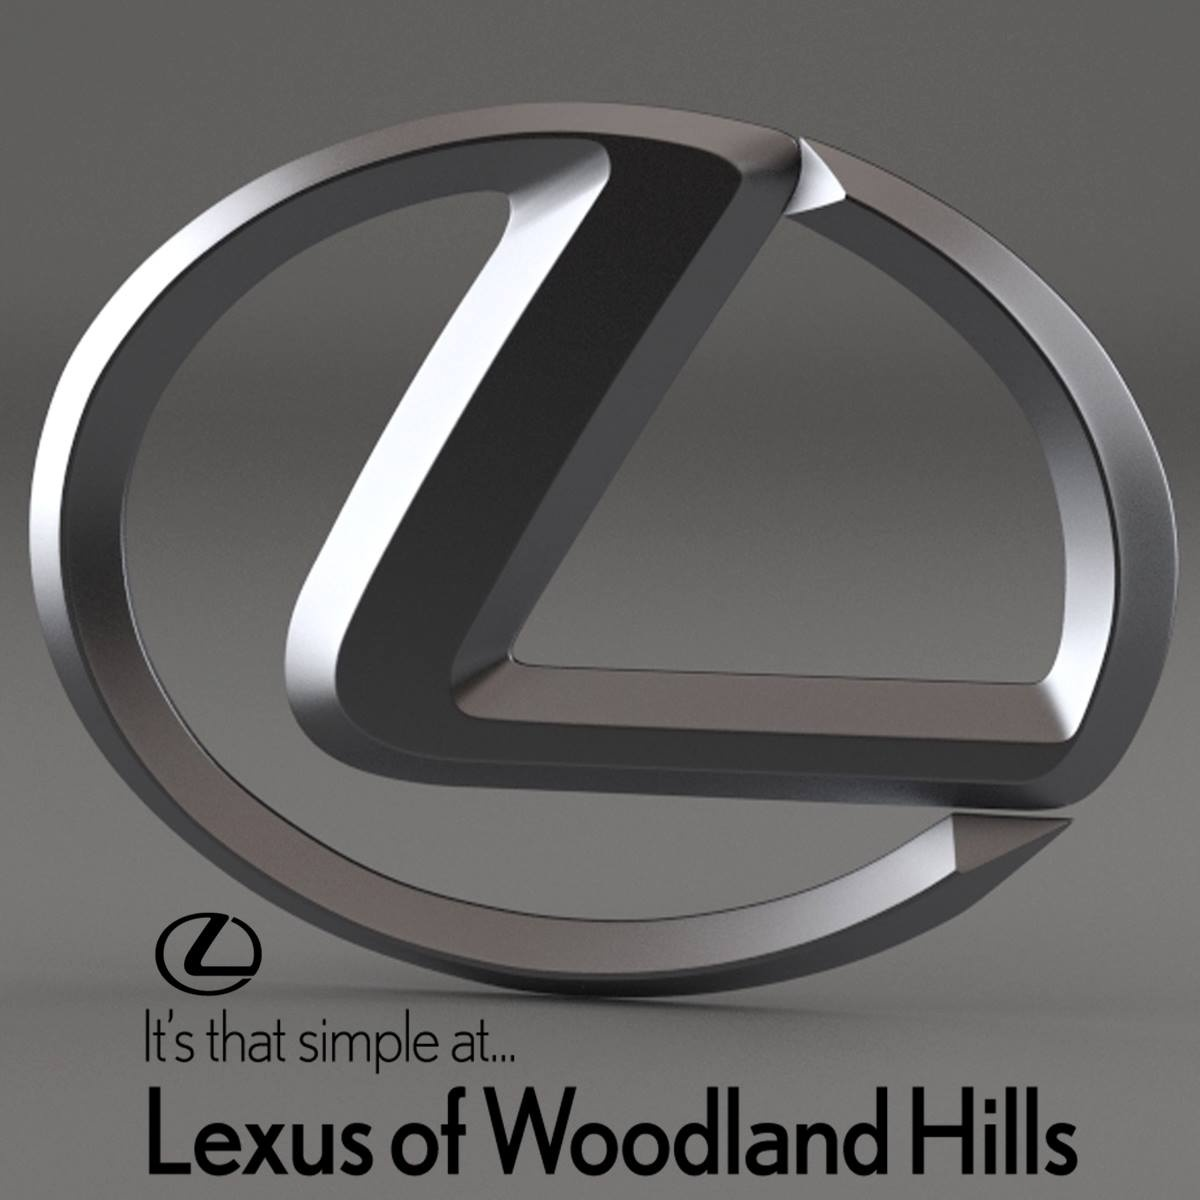 lexus of woodland hills - woodland hills, ca: read consumer reviews